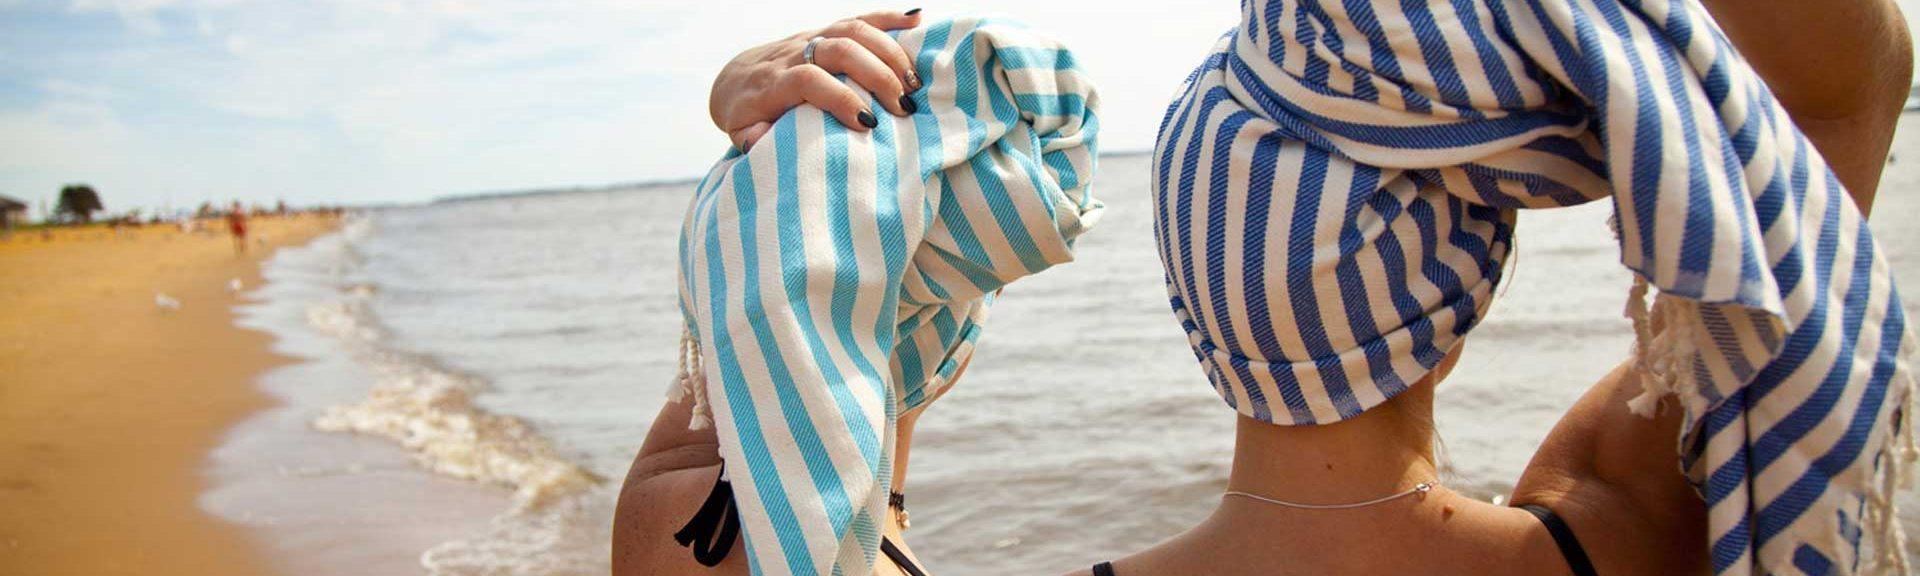 Buldano Beach & Summer